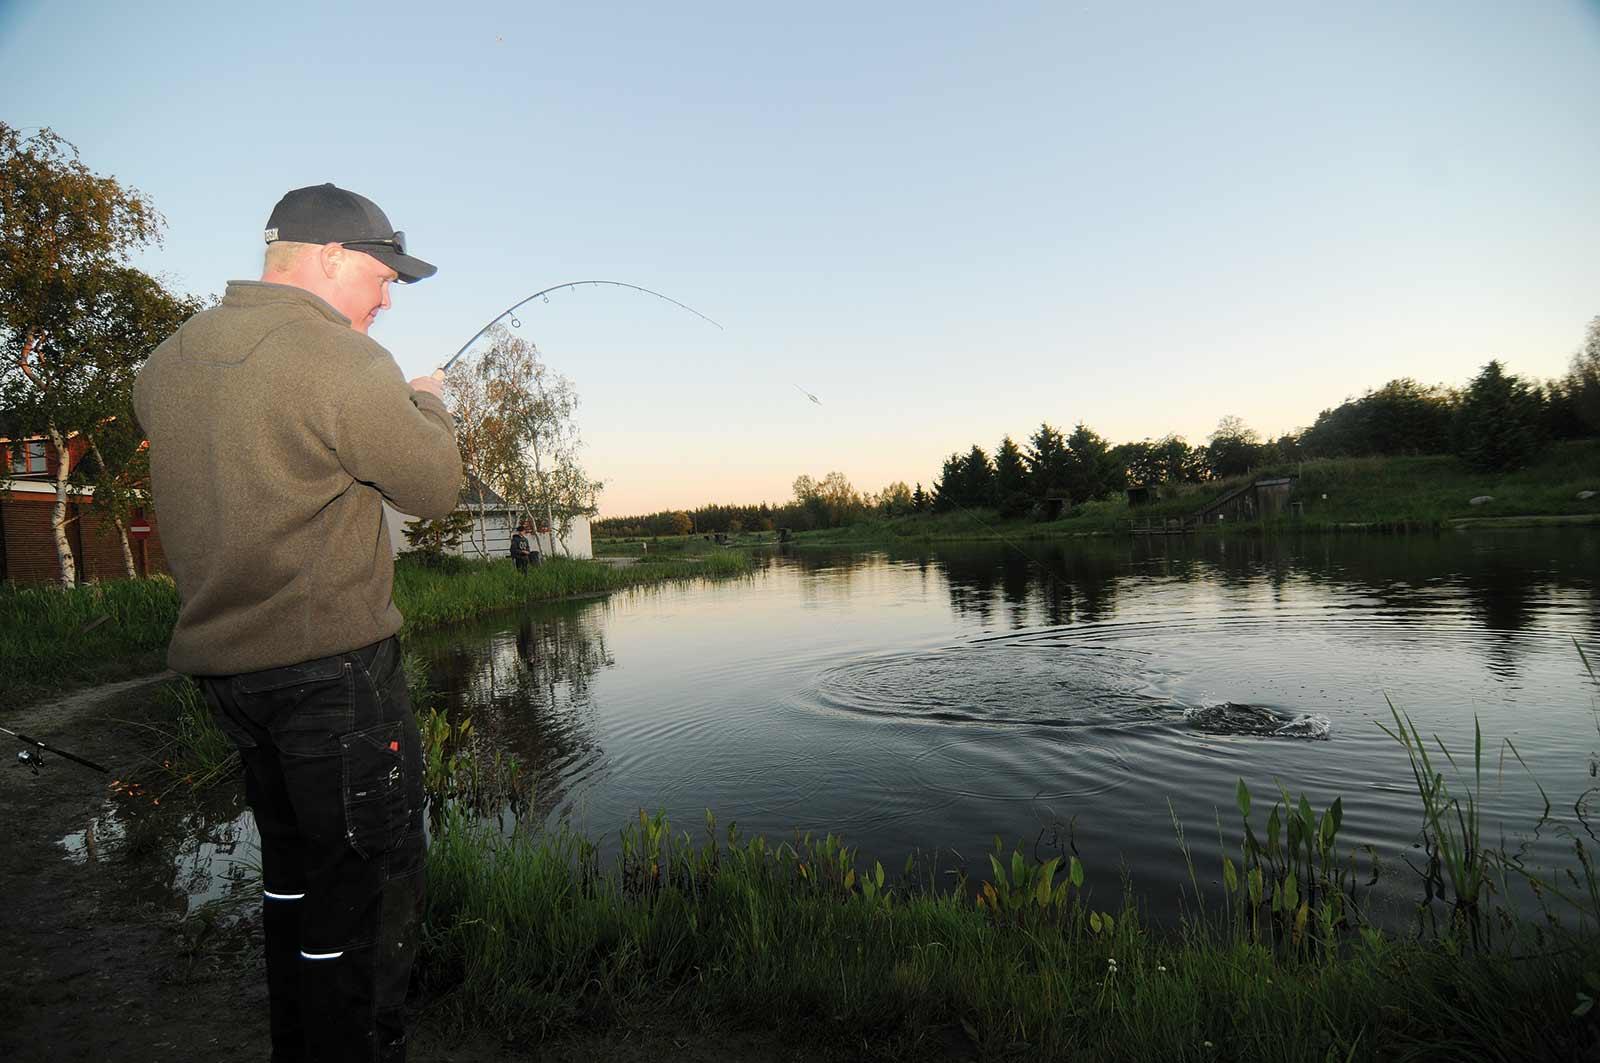 Natfiskeri i put & take